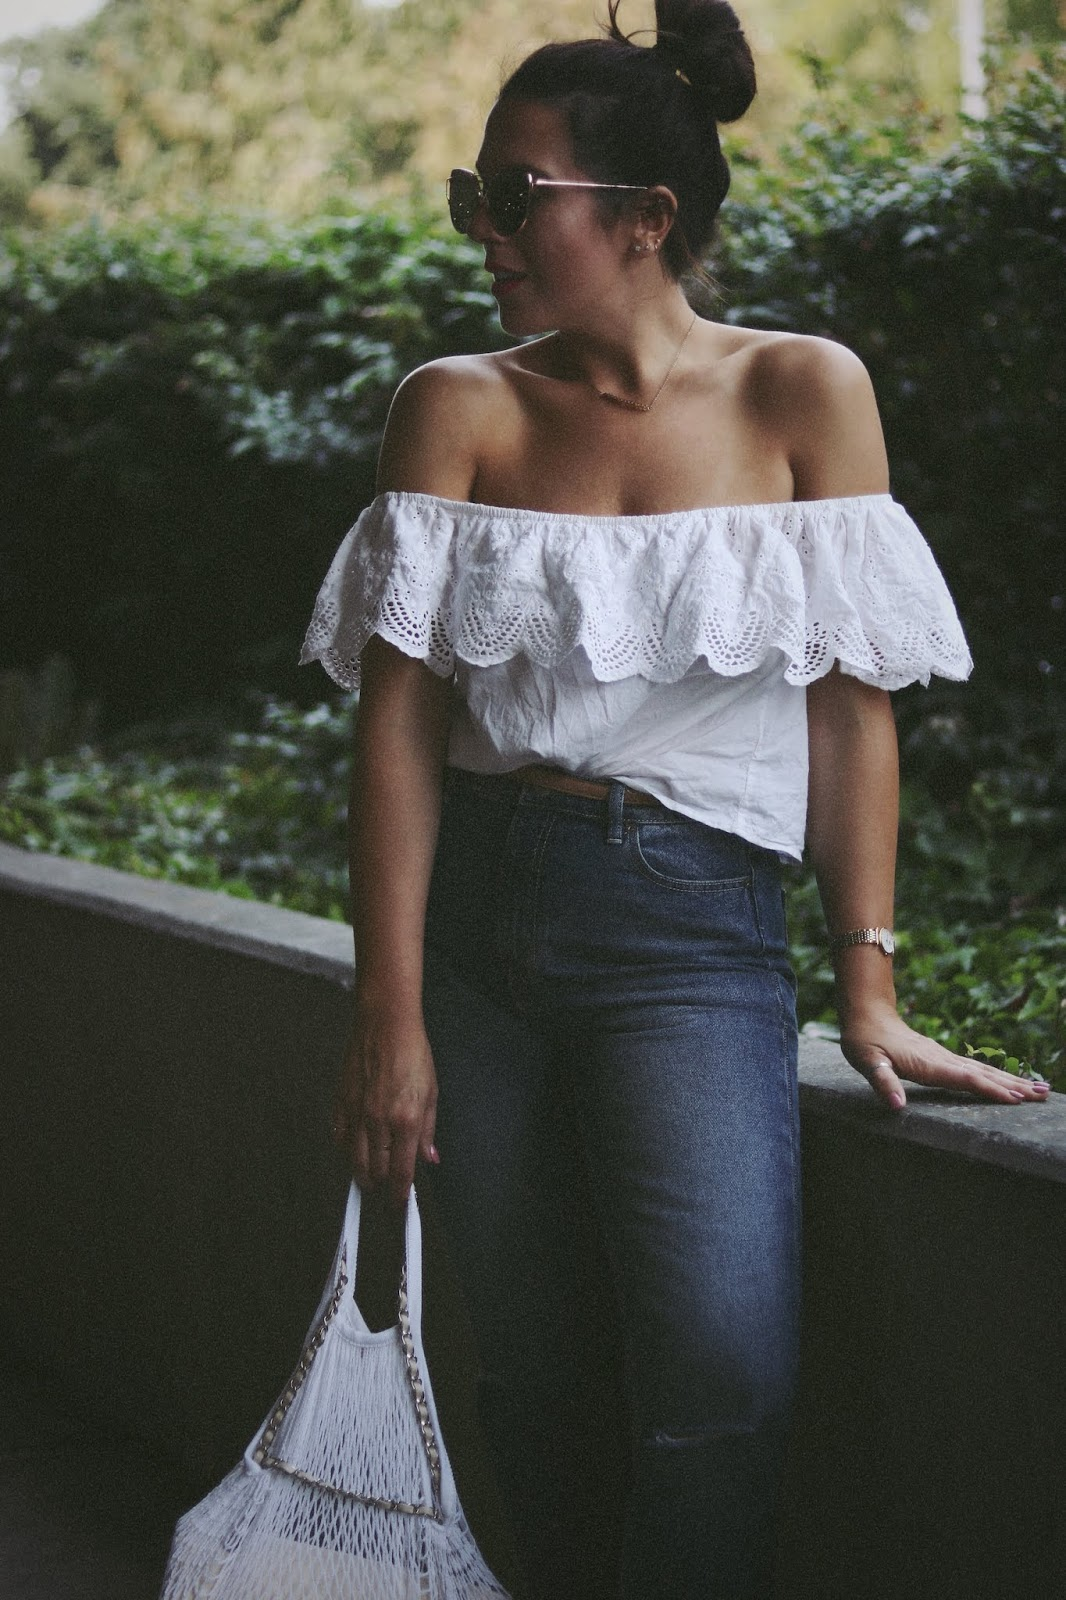 RVCA jeans Chanel french riviera bag net handbag vancouver blogger aleesha harris